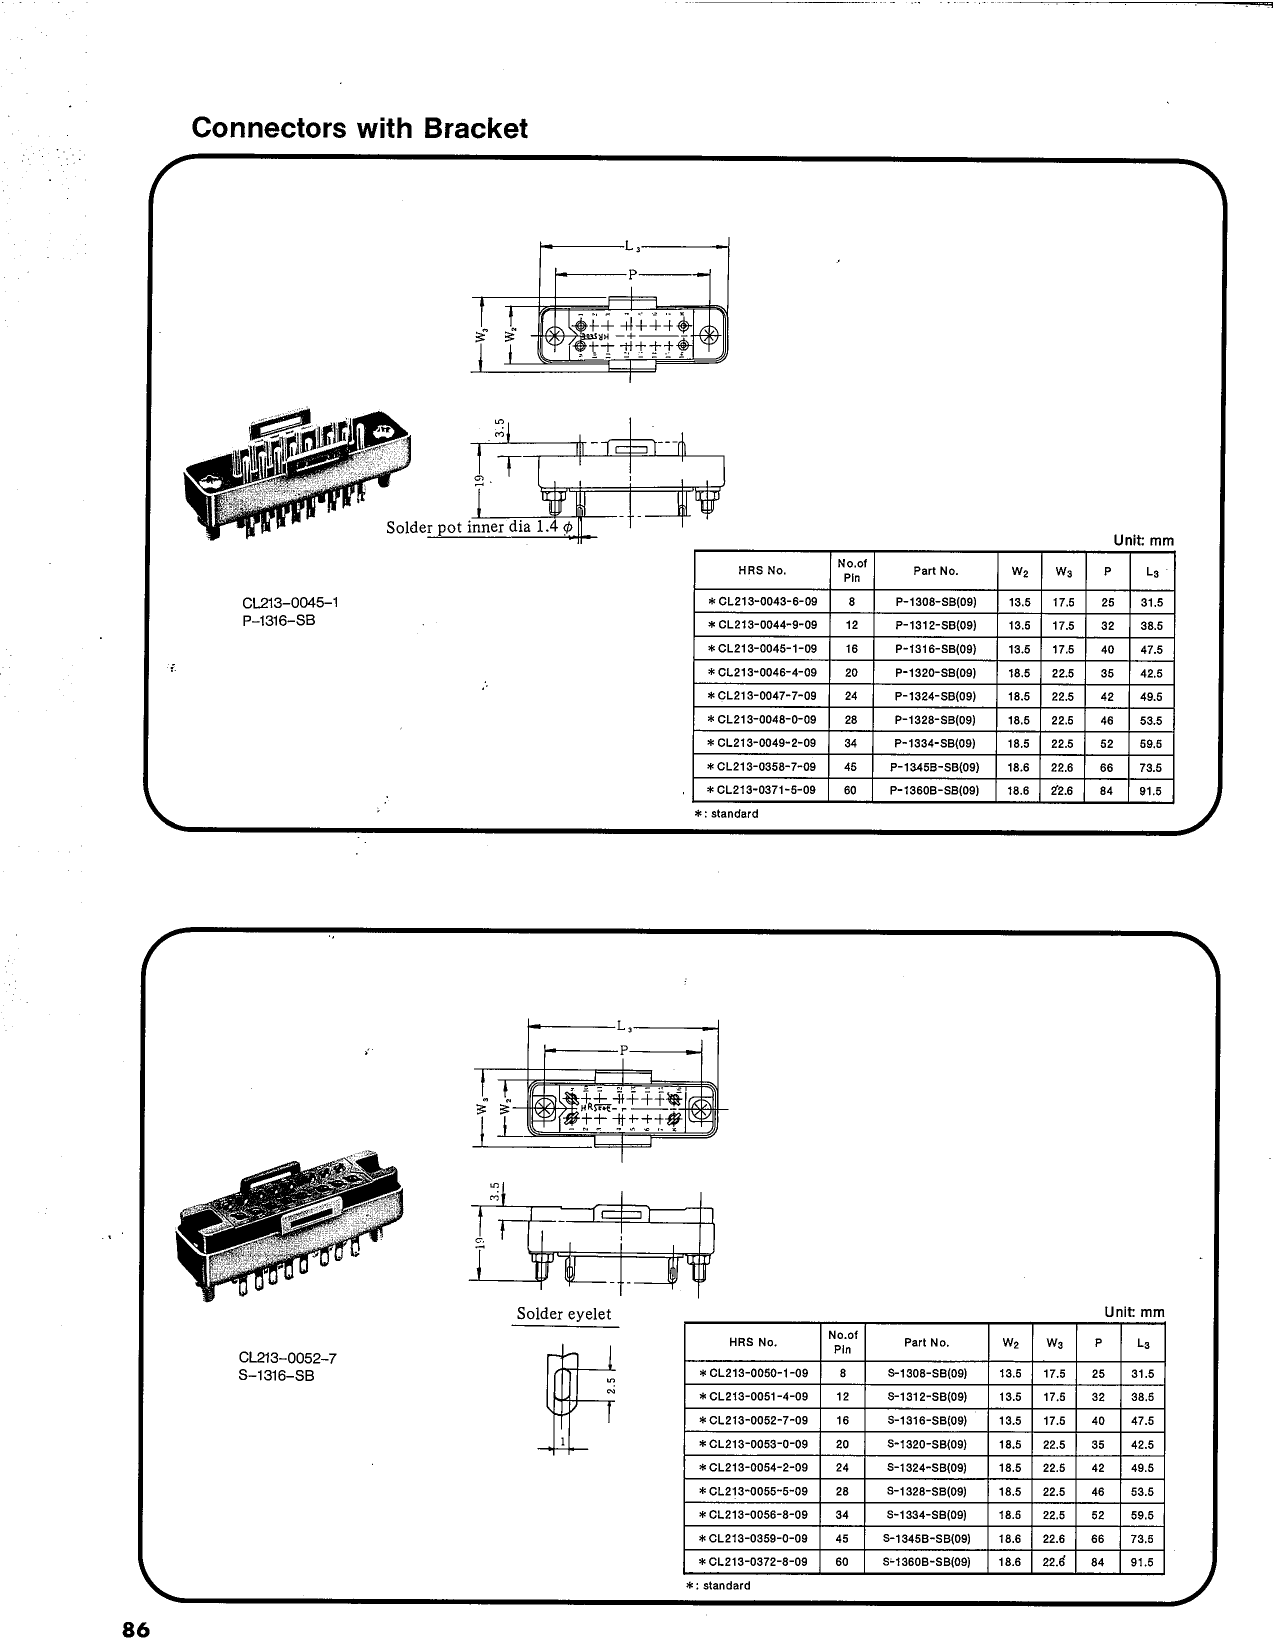 S-1345W-H pdf